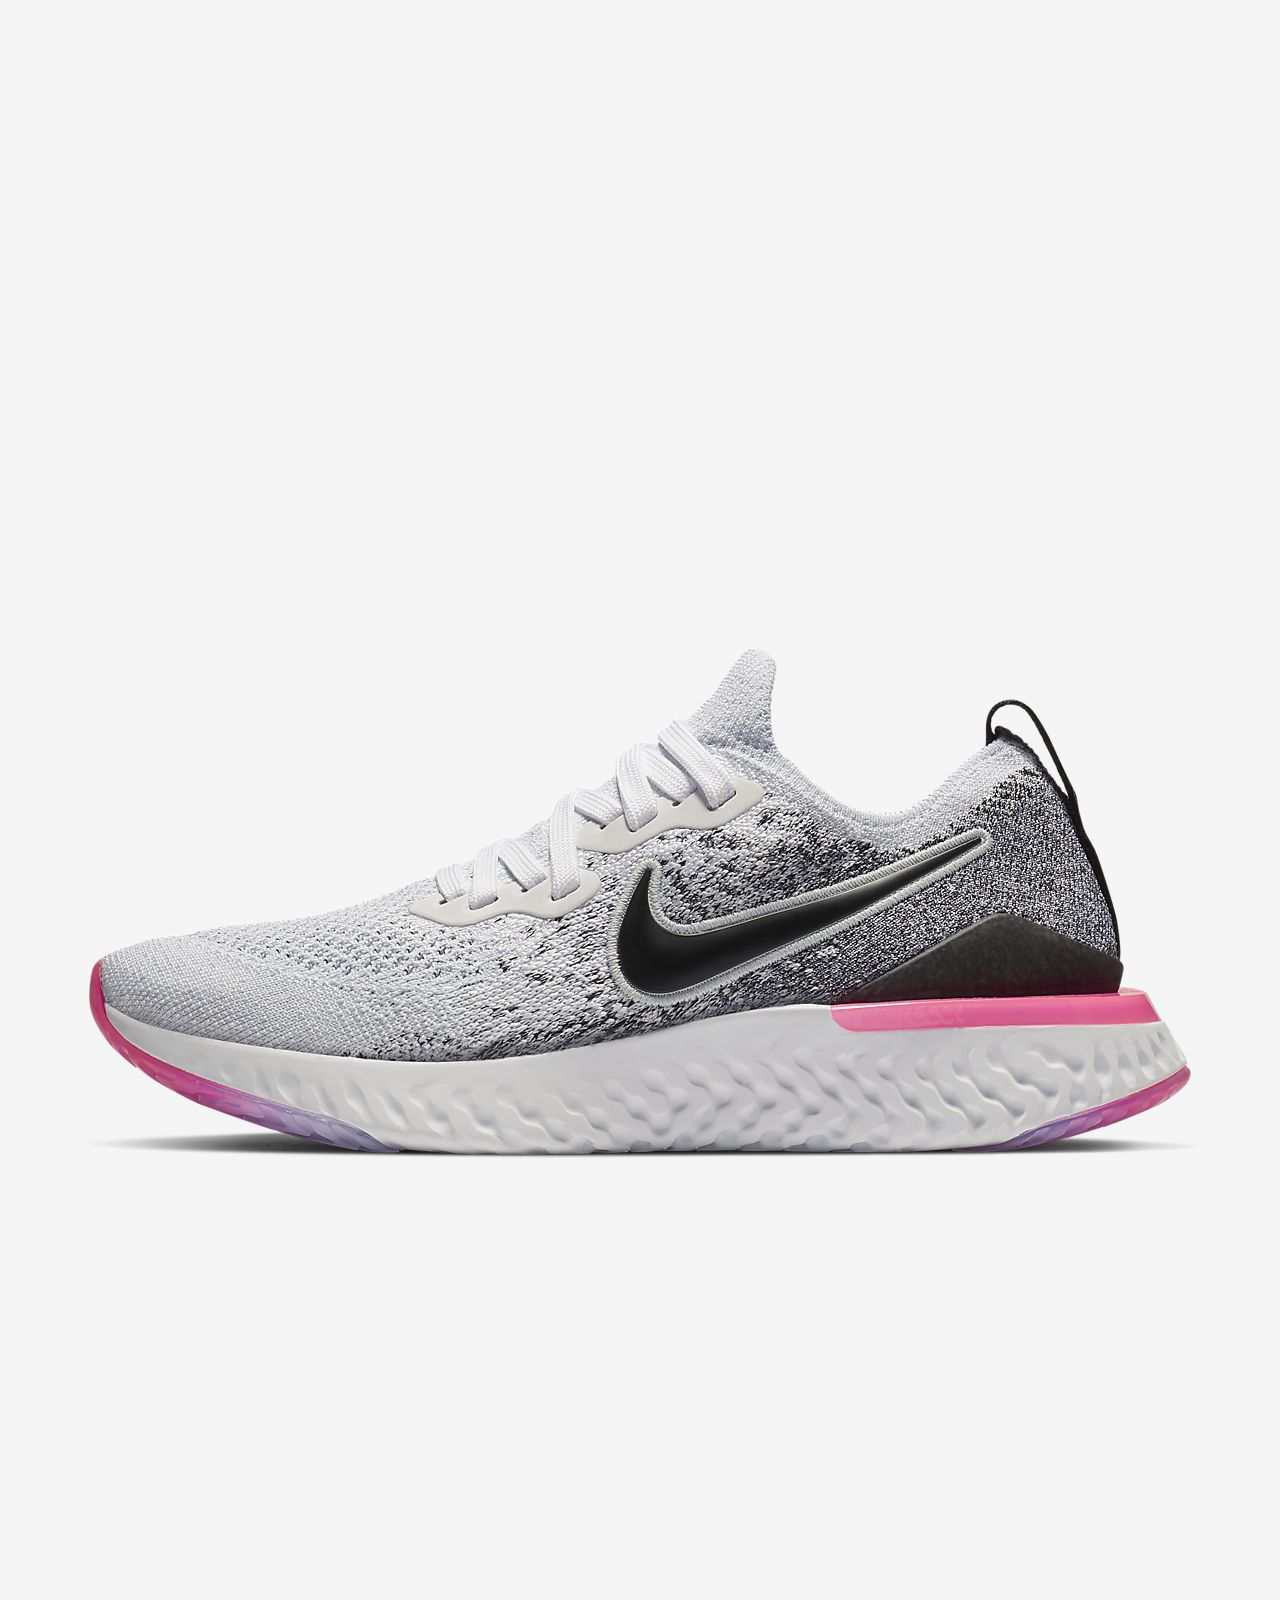 d3306dcdf7b7d Nike Epic React Flyknit 2 Women's Running Shoe. Nike.com PT